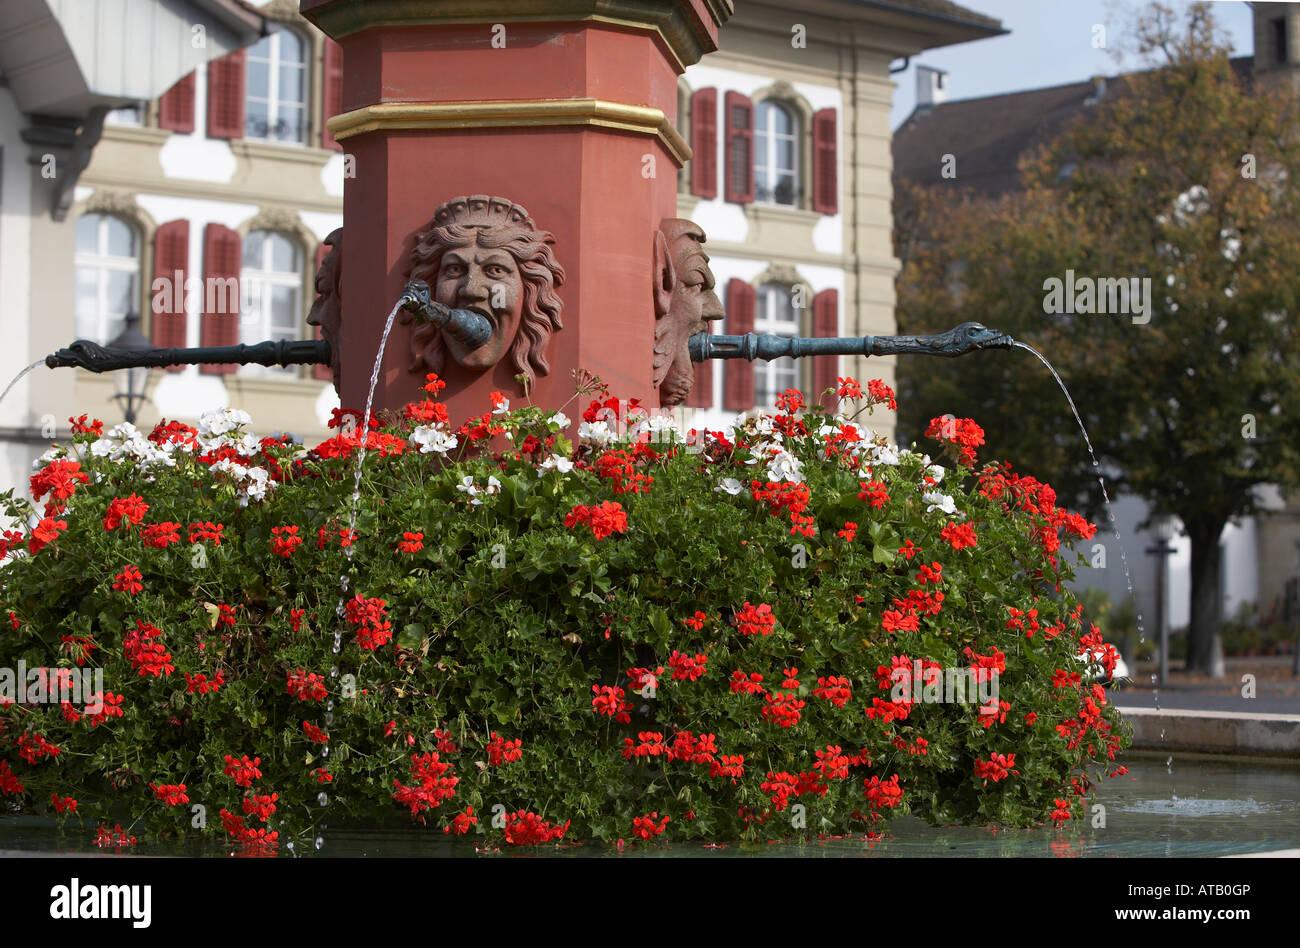 Niklaus Thut fountain, Zofingen, Switzerland - Stock Image